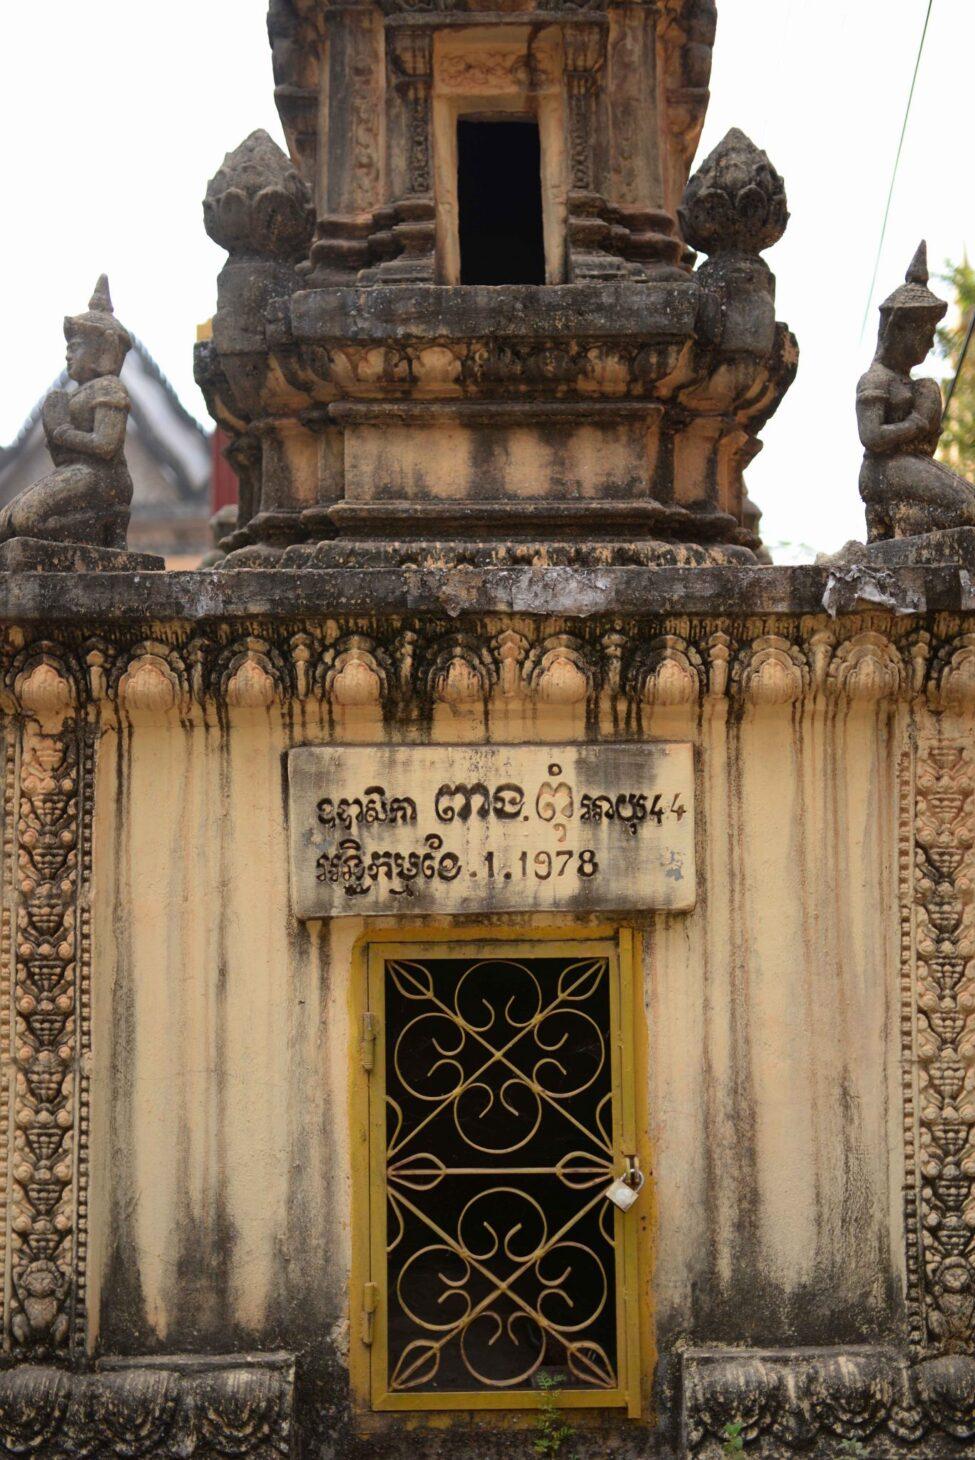 Cemetery in Siem Reap, Cambodia